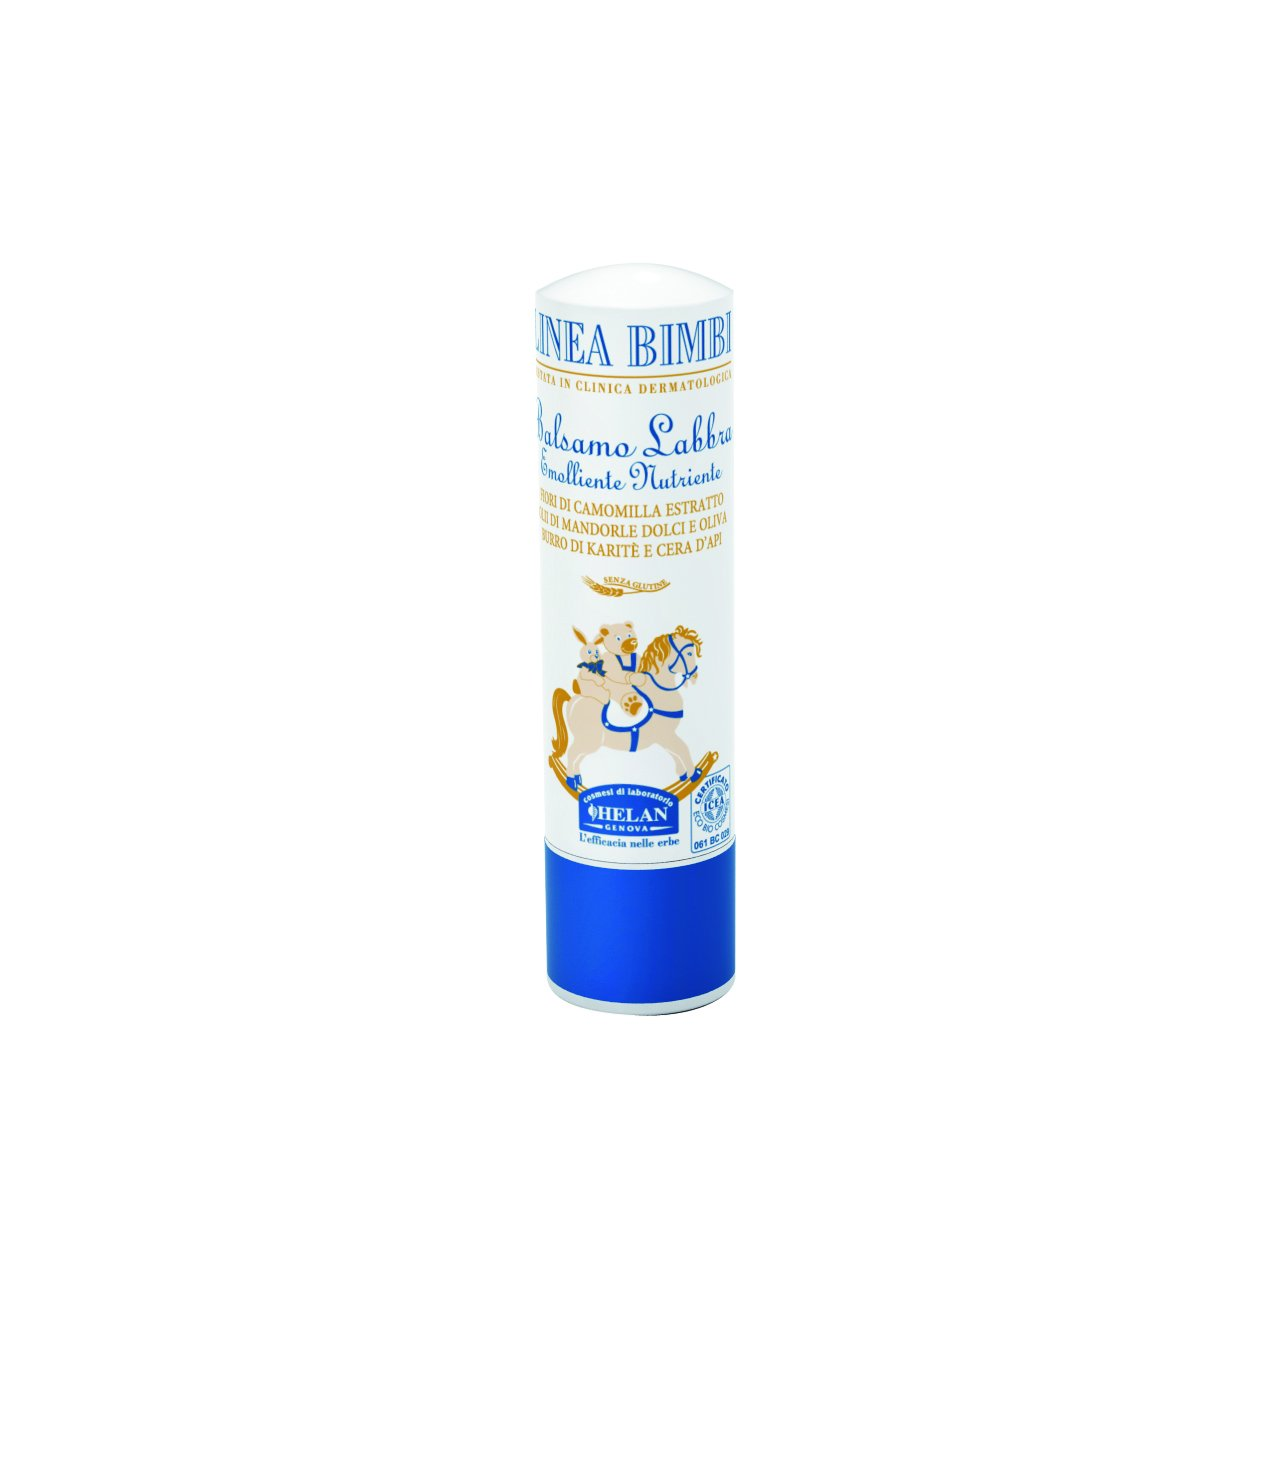 Linea Bimbi Baby Lip Balm for Cracked Chapped Lips Certified Organic, Paraben PEG SLS Free 4.5ml Helan